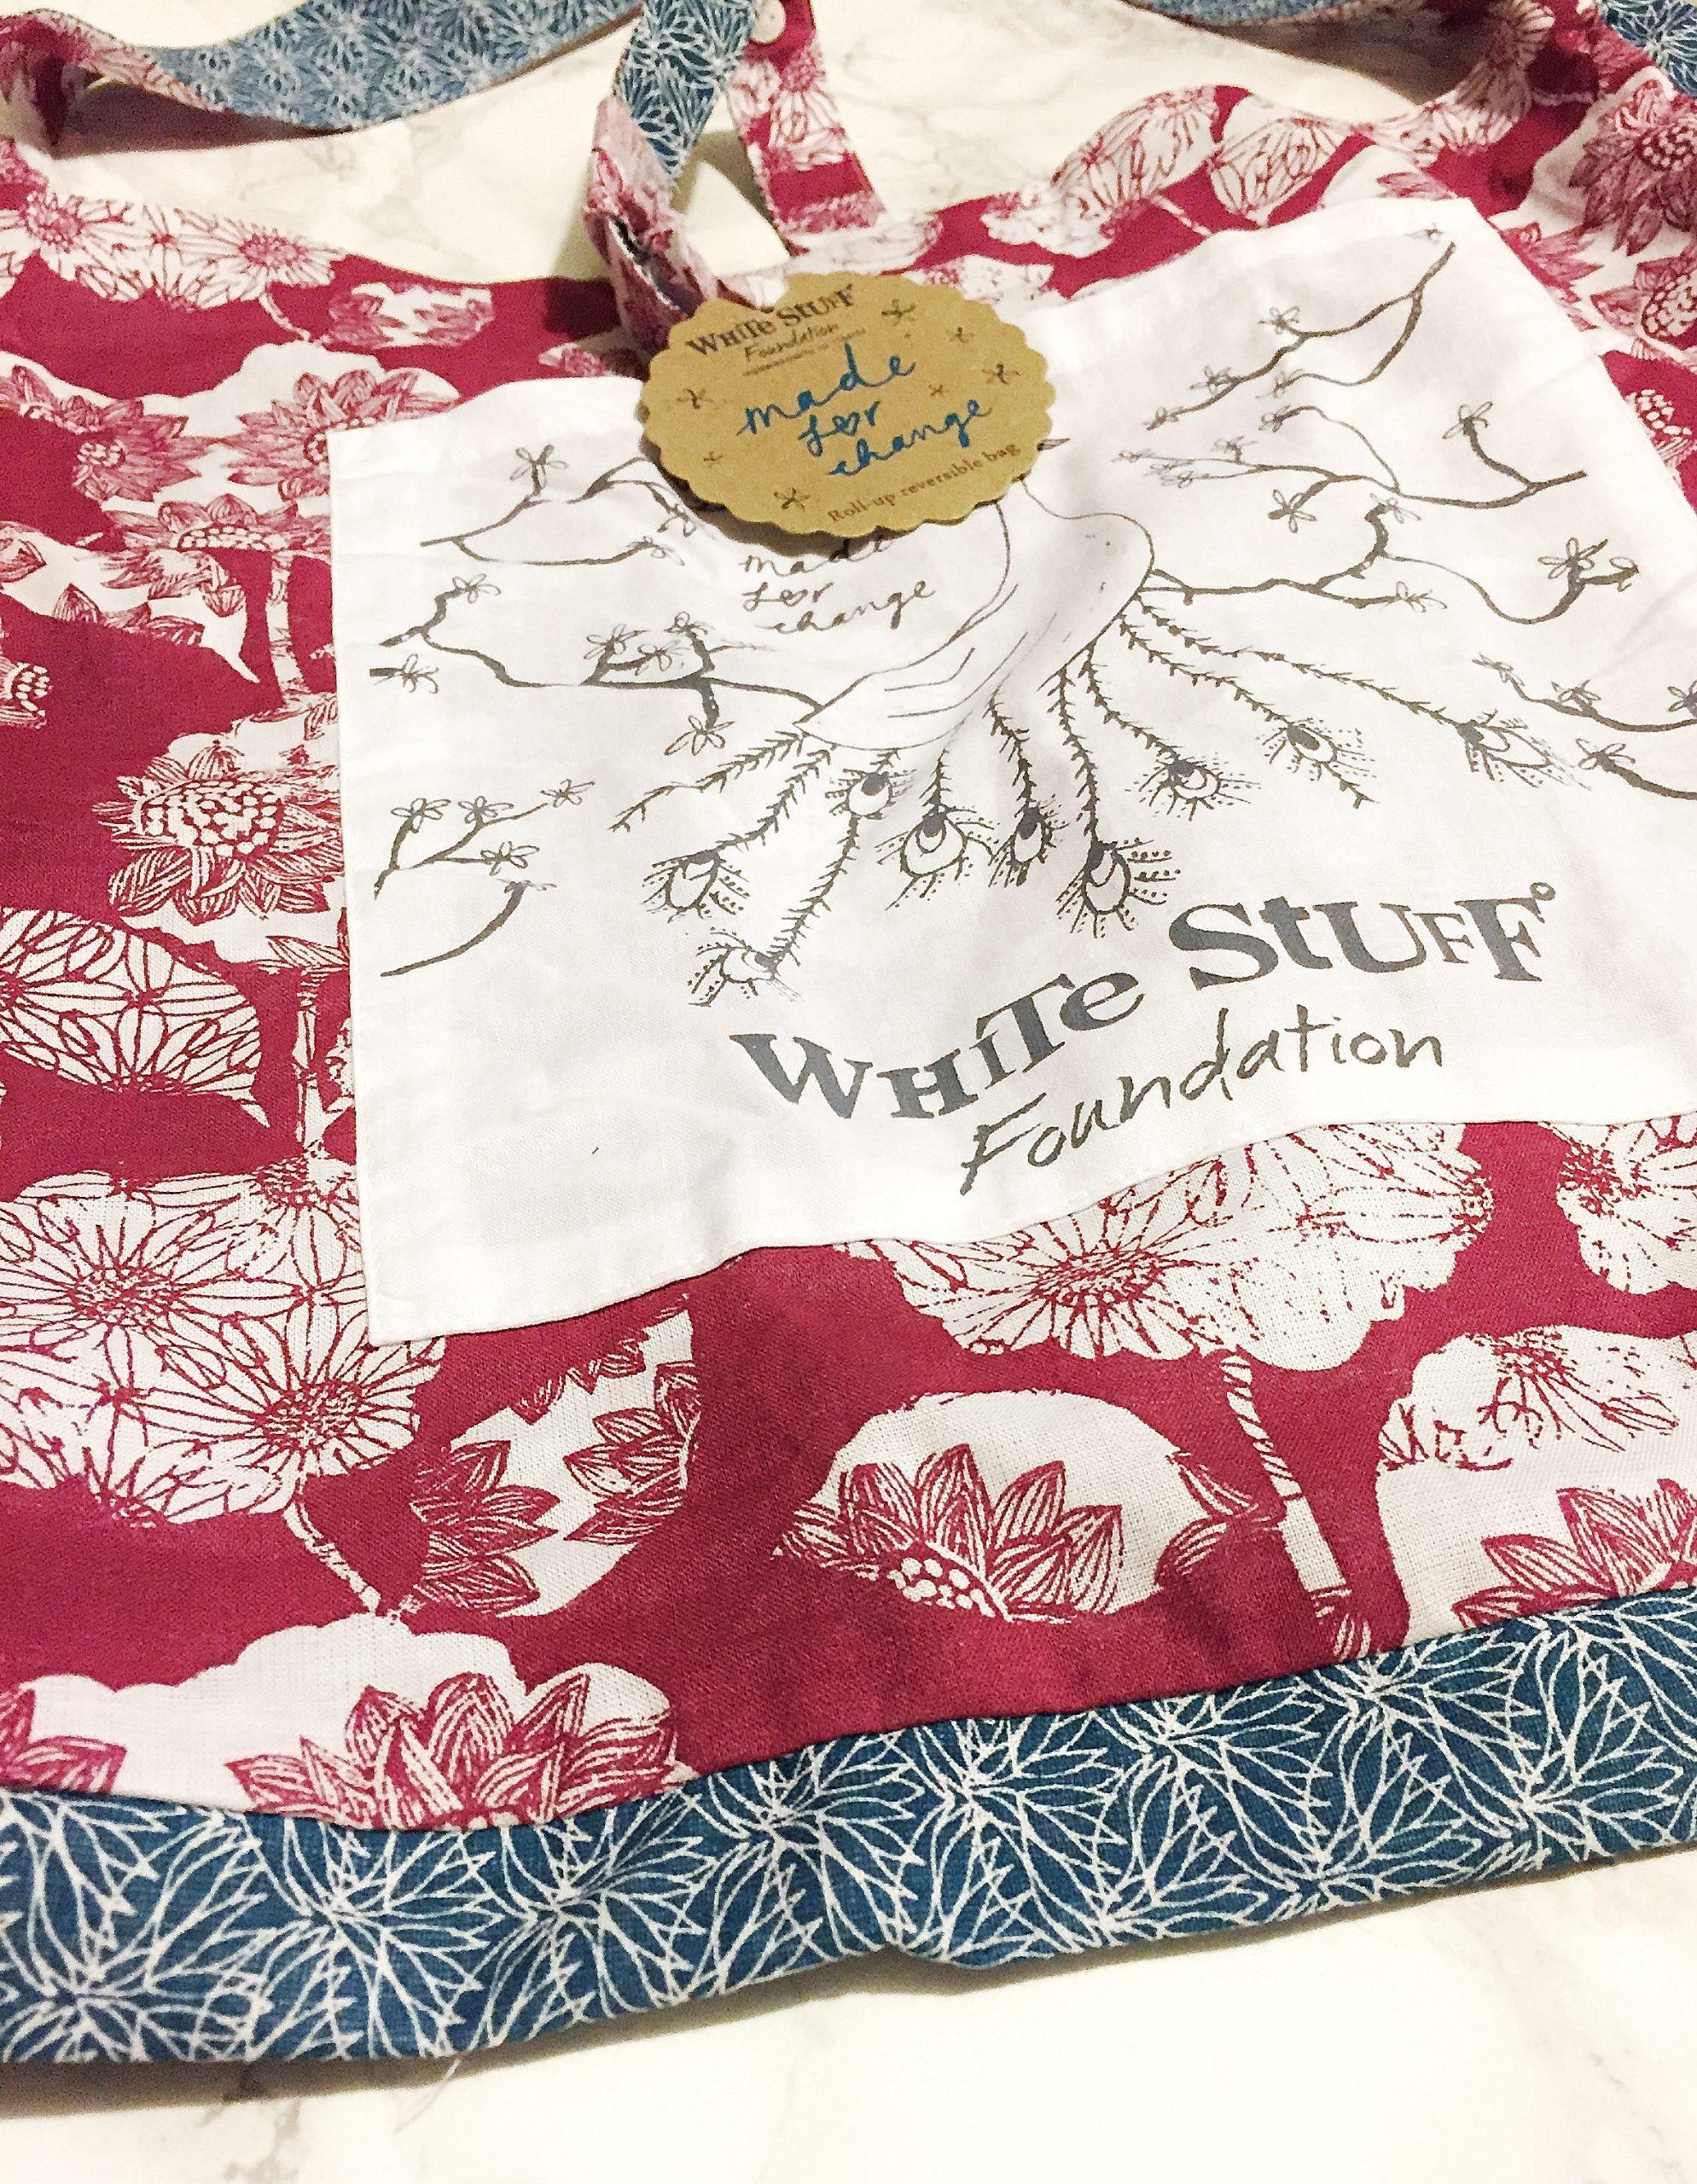 White Stuff Bargain – Made For Change Bag